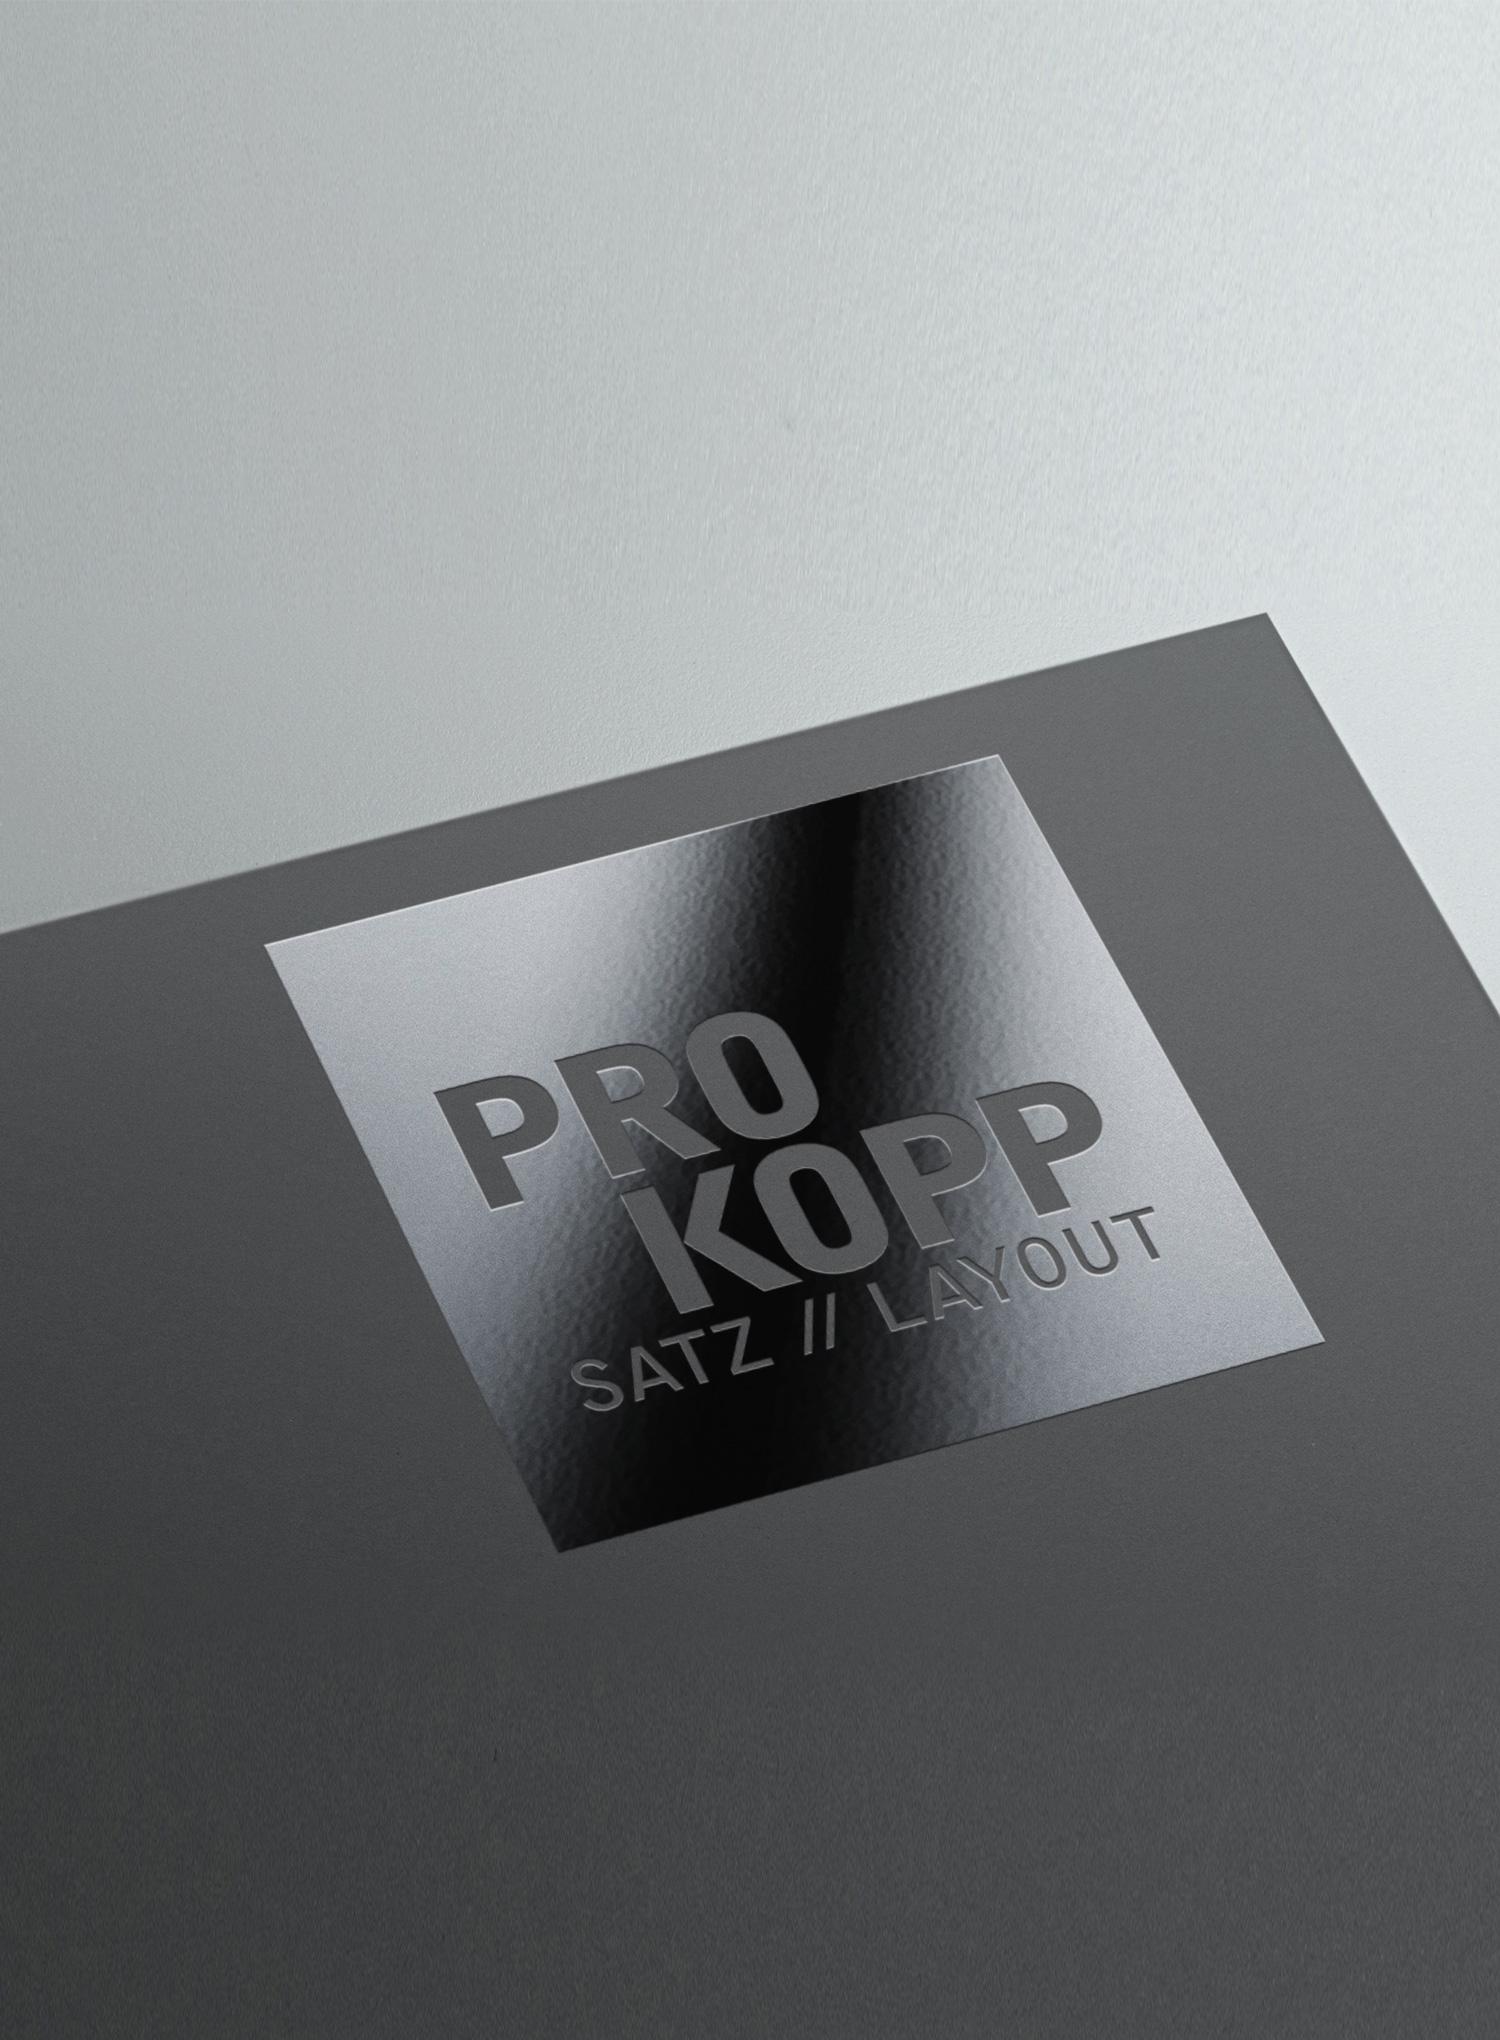 PROKOPP SATZ // LAYOUT, Ingo Prokopp